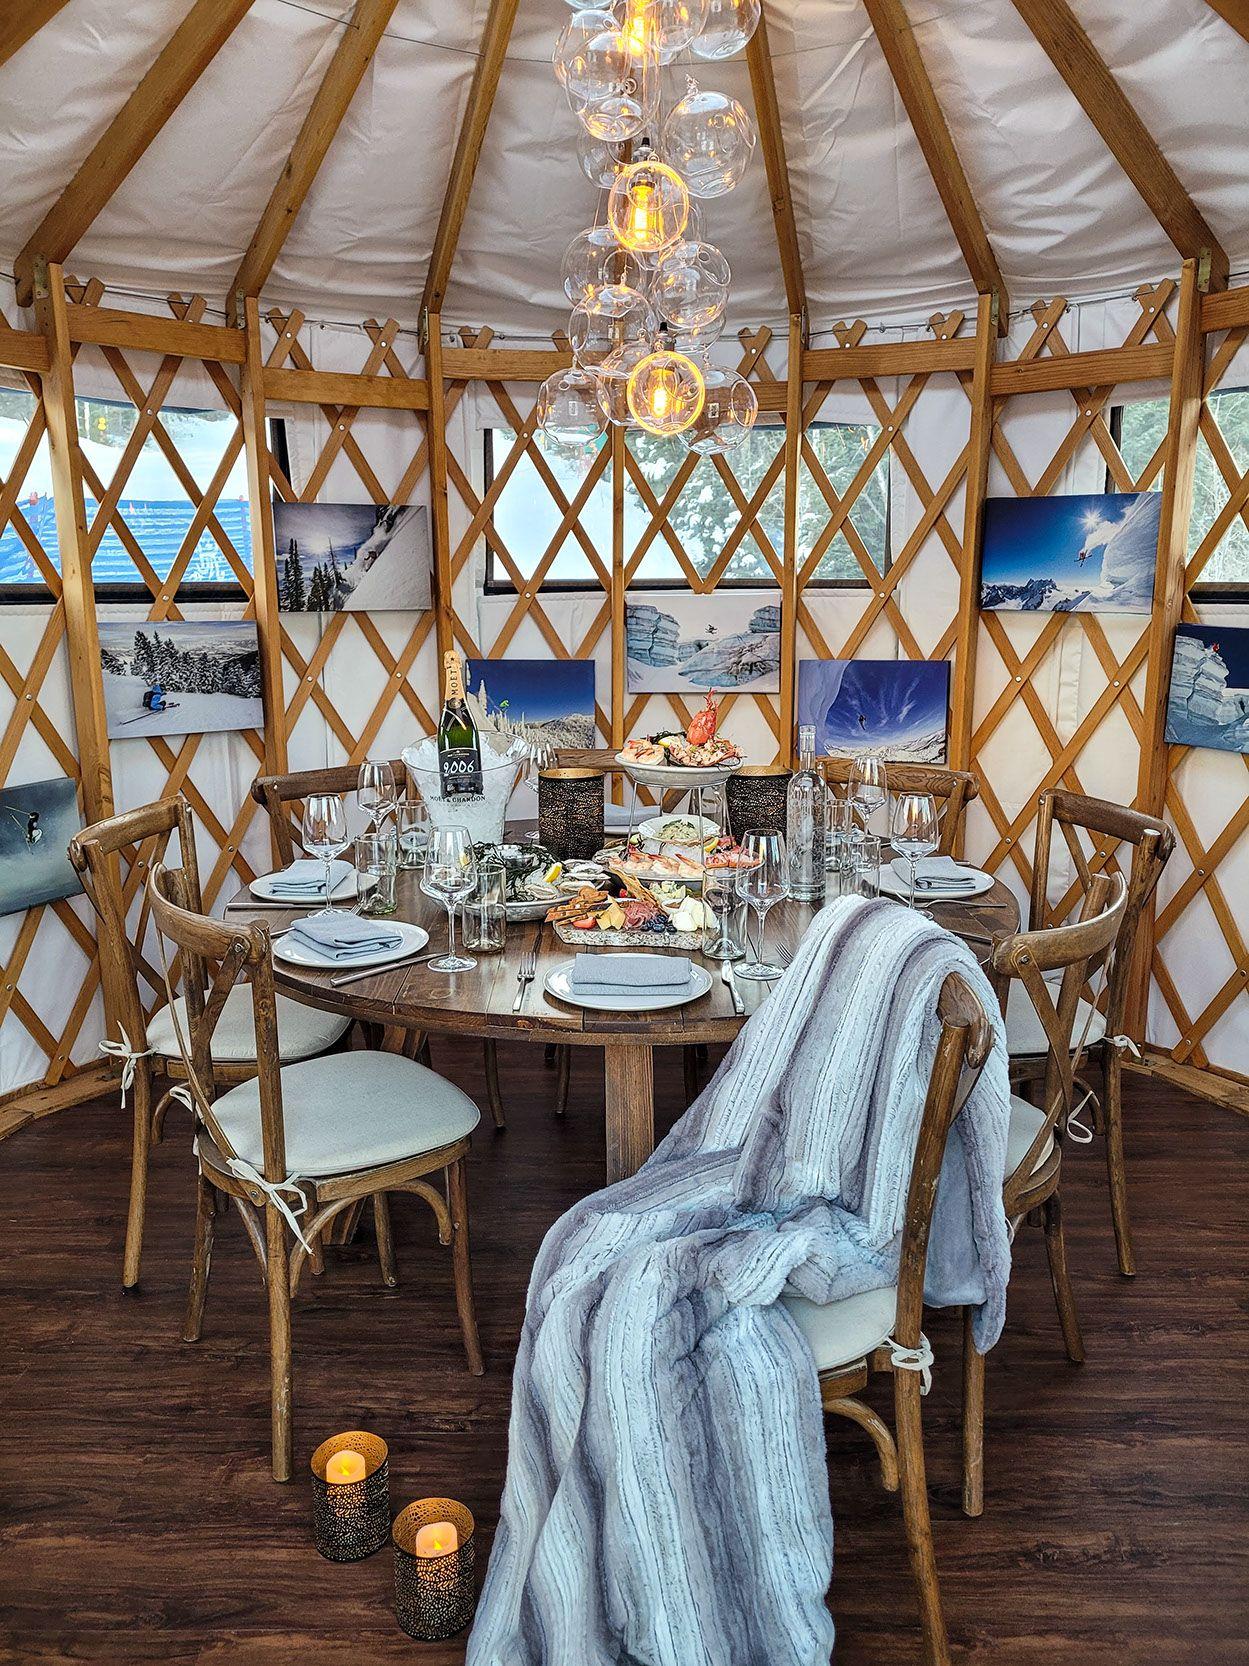 Opening of Yurt Village at the St. Regis Deer Valley Announced